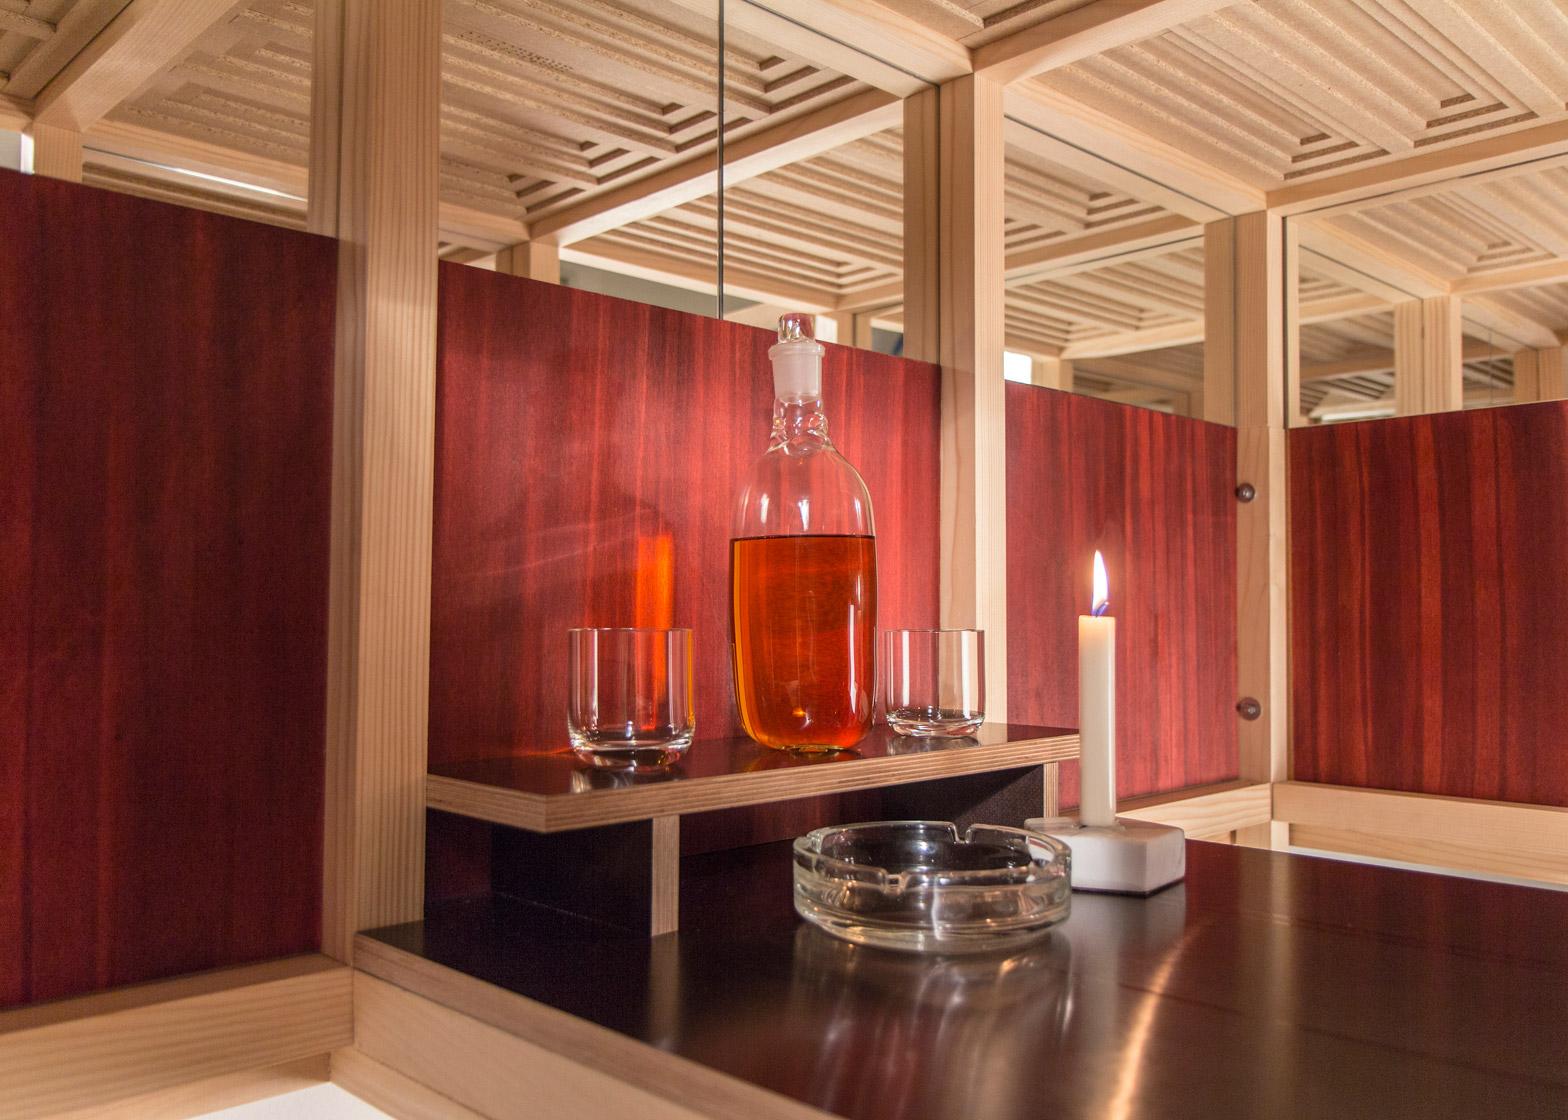 Bar Non-Lieu by Breaded Escalope at Vienna Design Week 2015